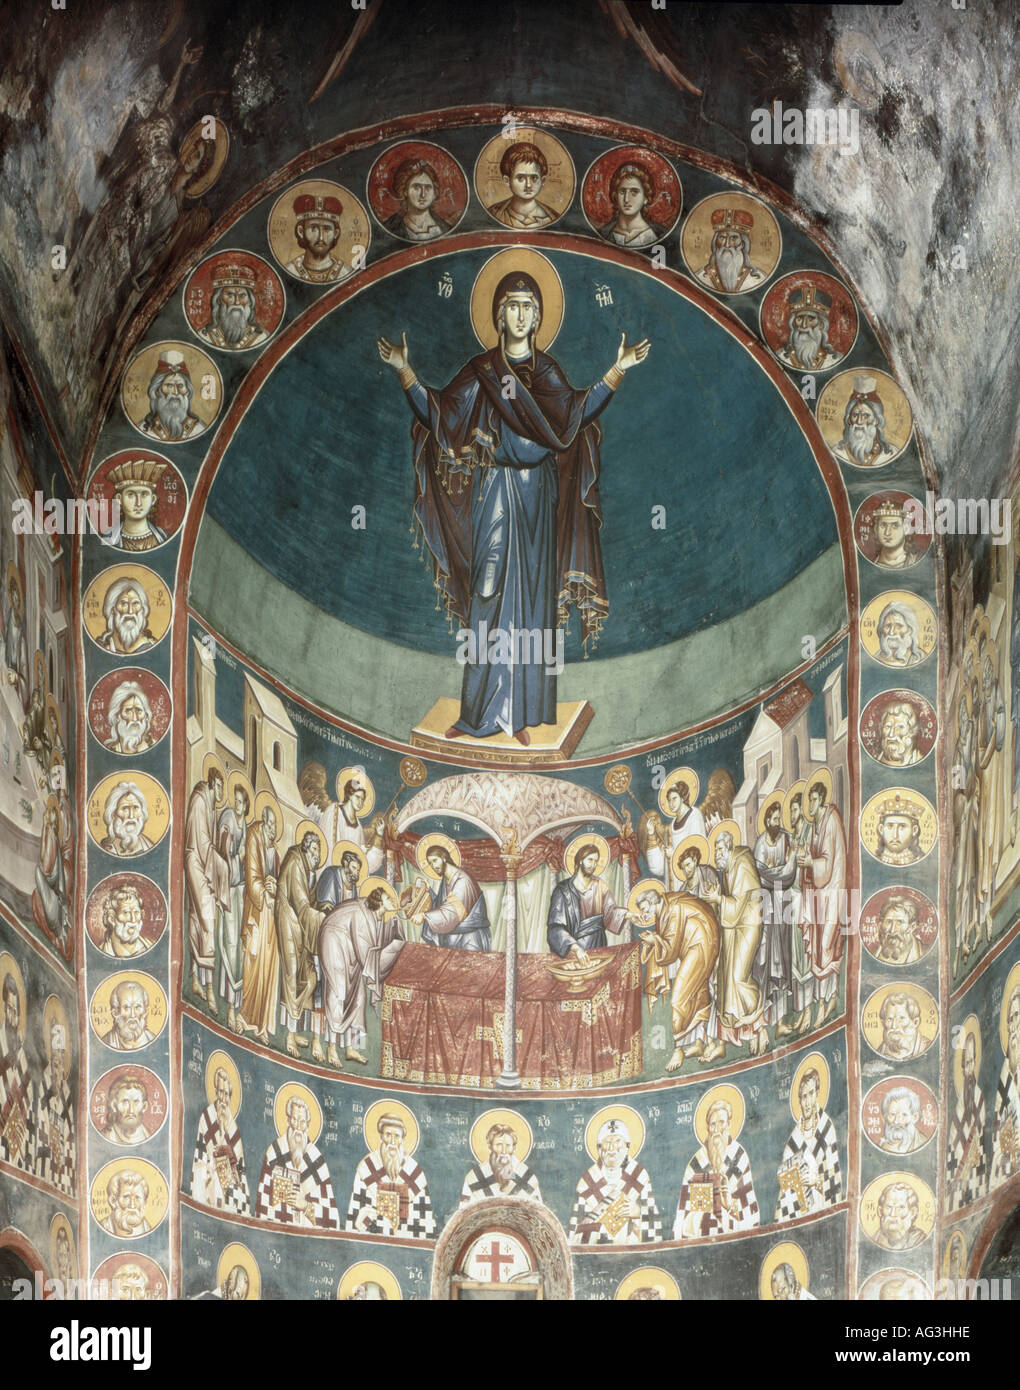 fine arts, religious art, apostles, fresco, communion of the apostles, circa 1295, Sveti Kliment church, Ohrid, Macedonia, Artist's Copyright has not to be cleared - Stock Image